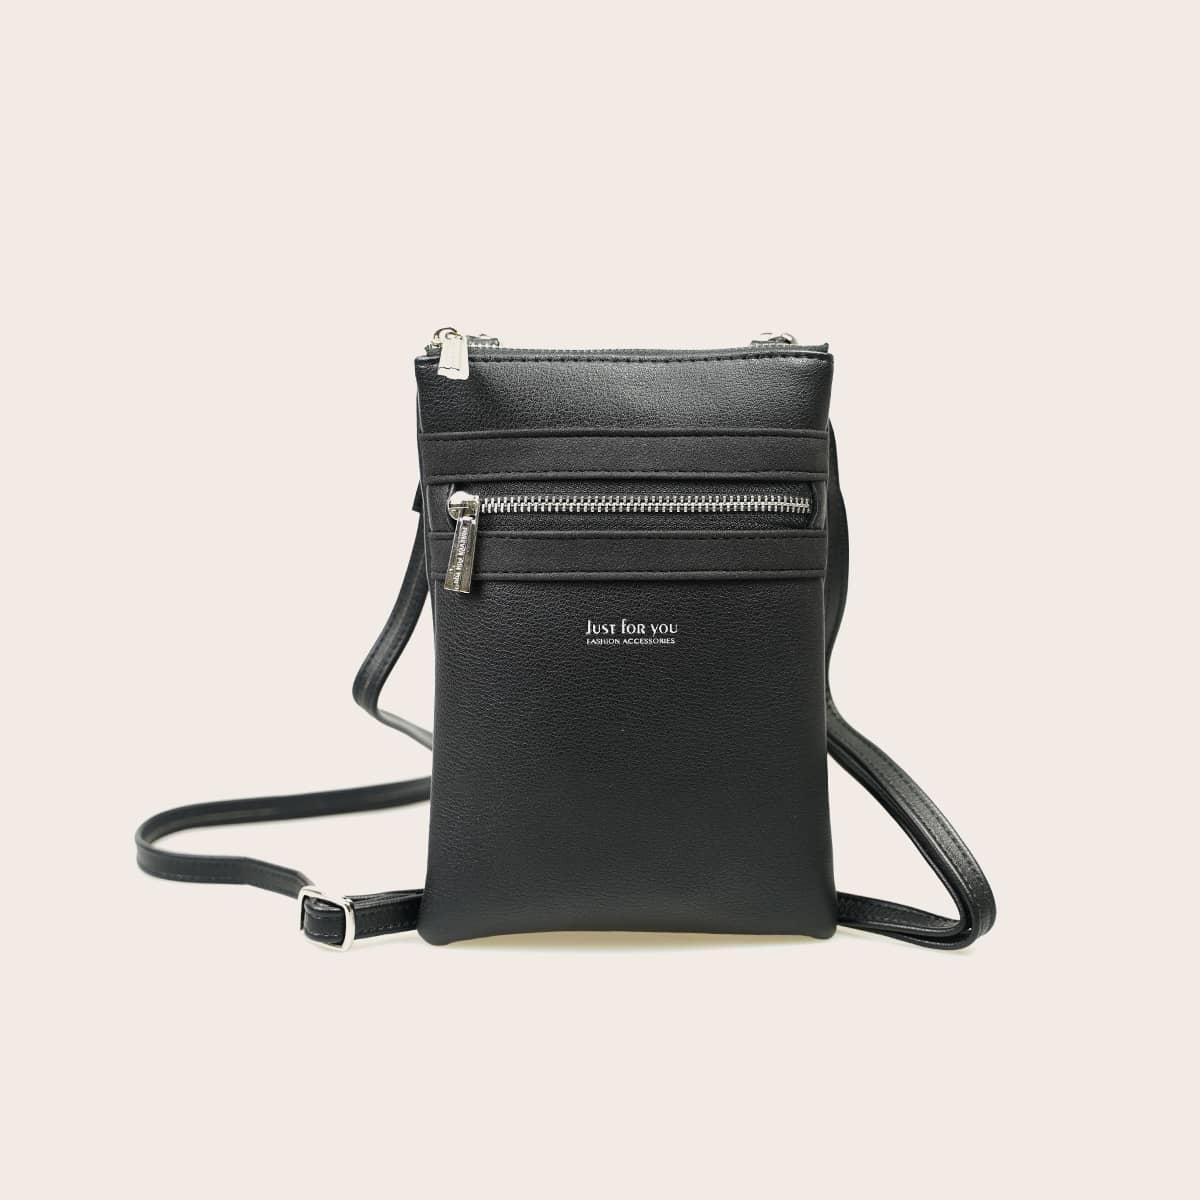 Передняя сумка через плечо на молнии фото